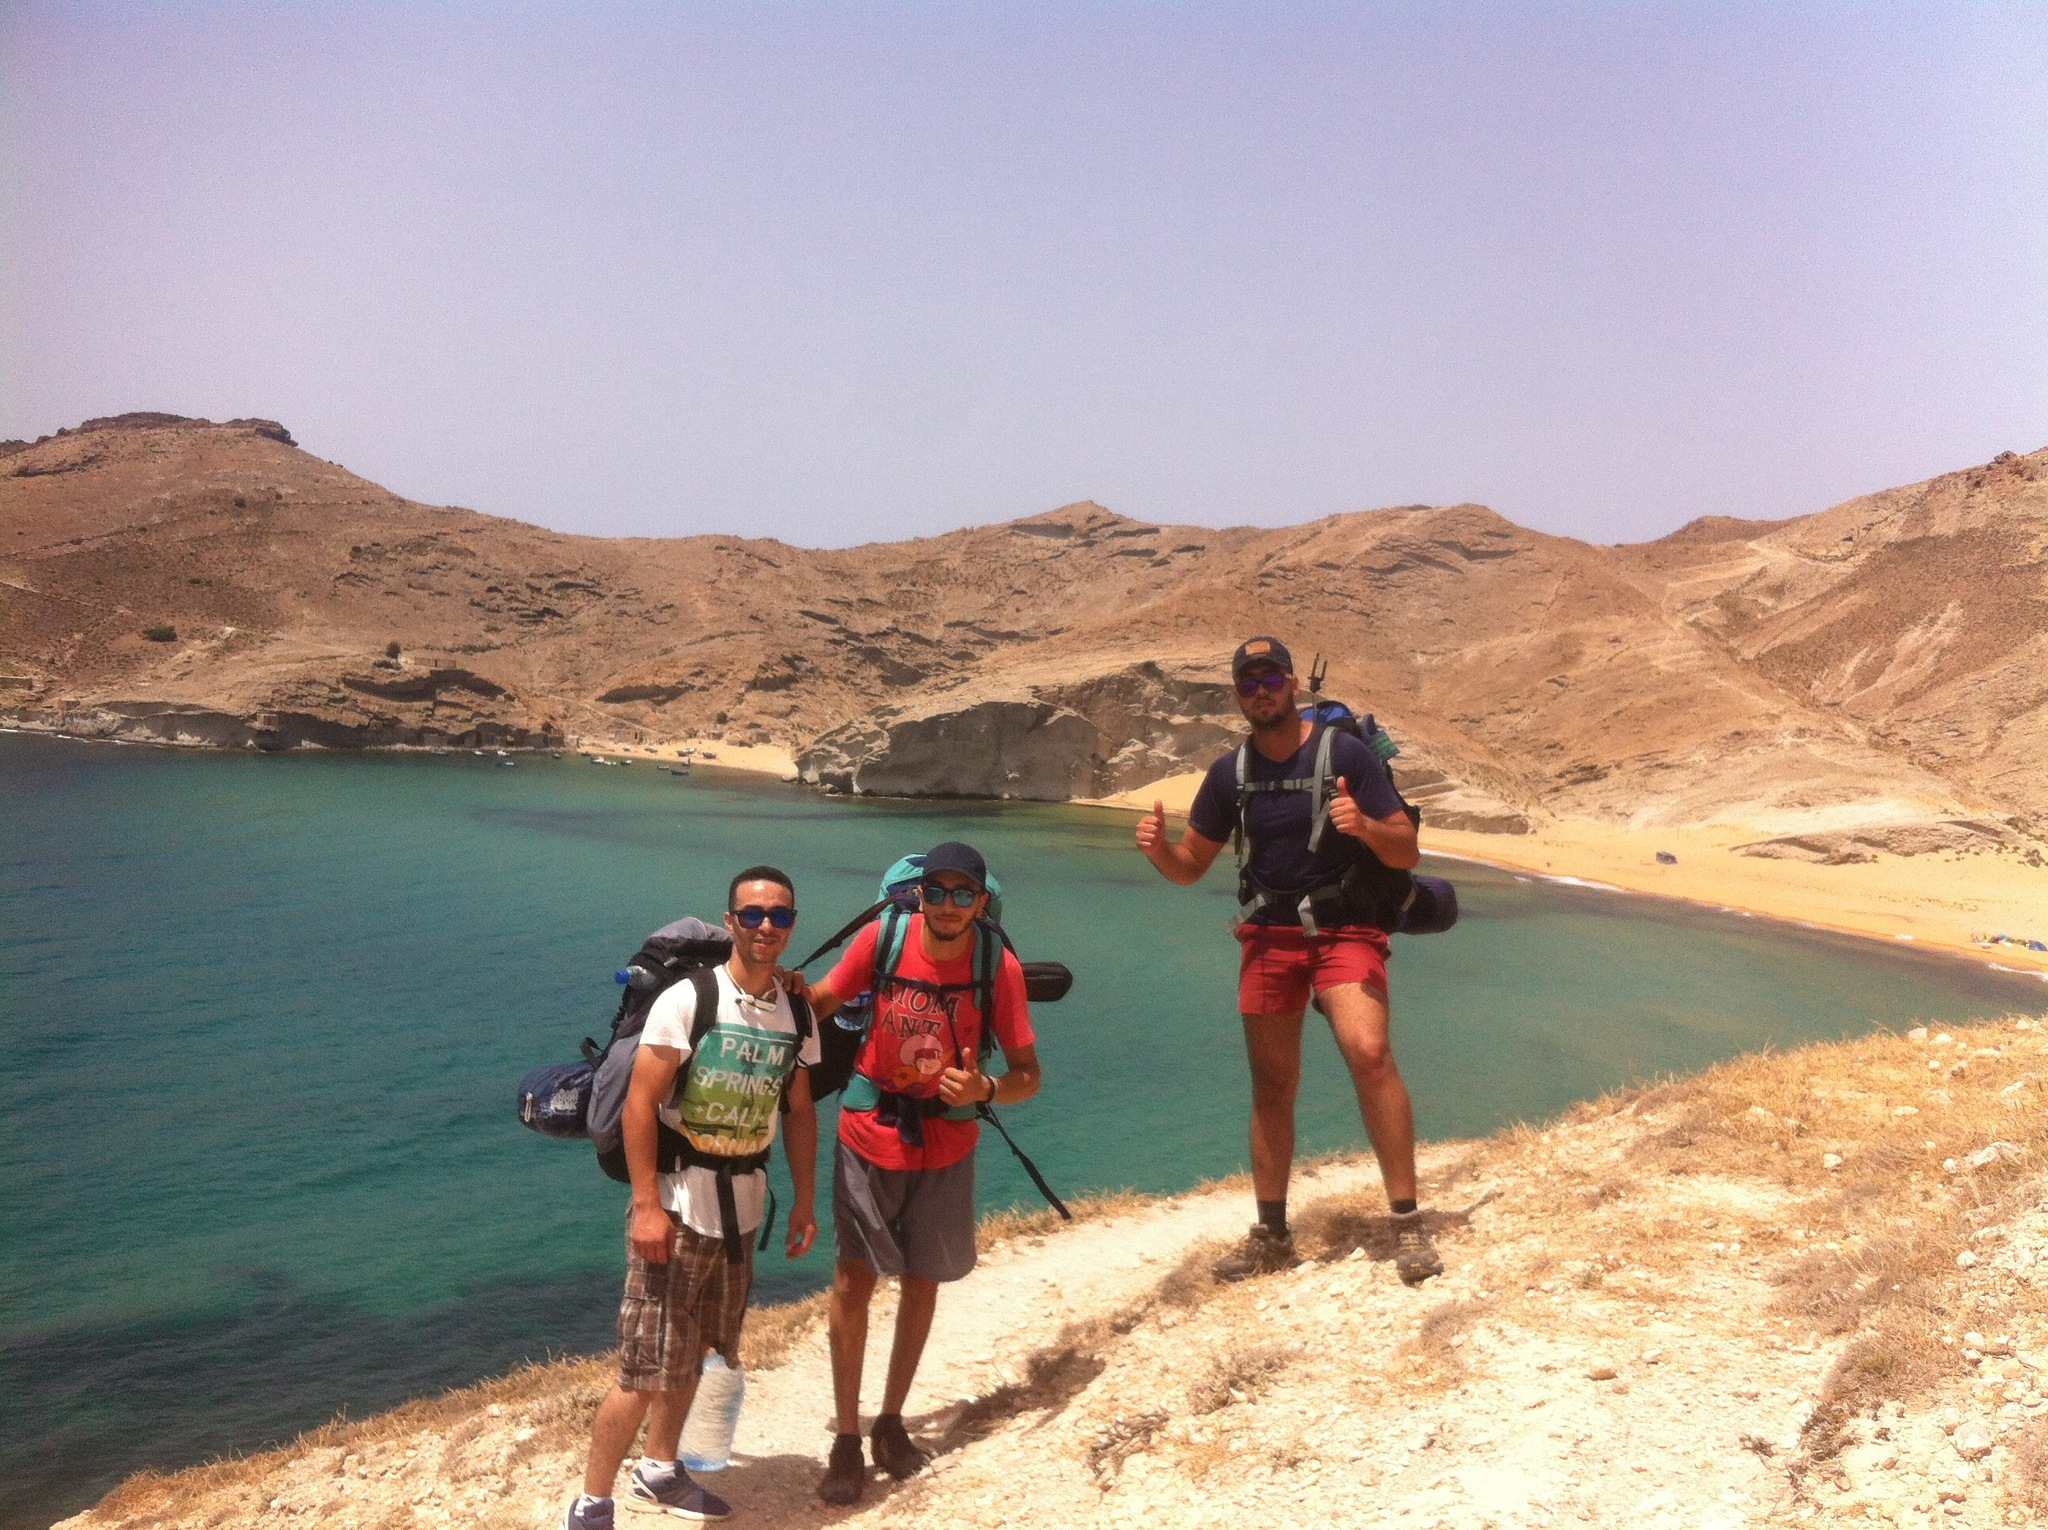 Trip in Morocco - charrana beach   by Issam Koza